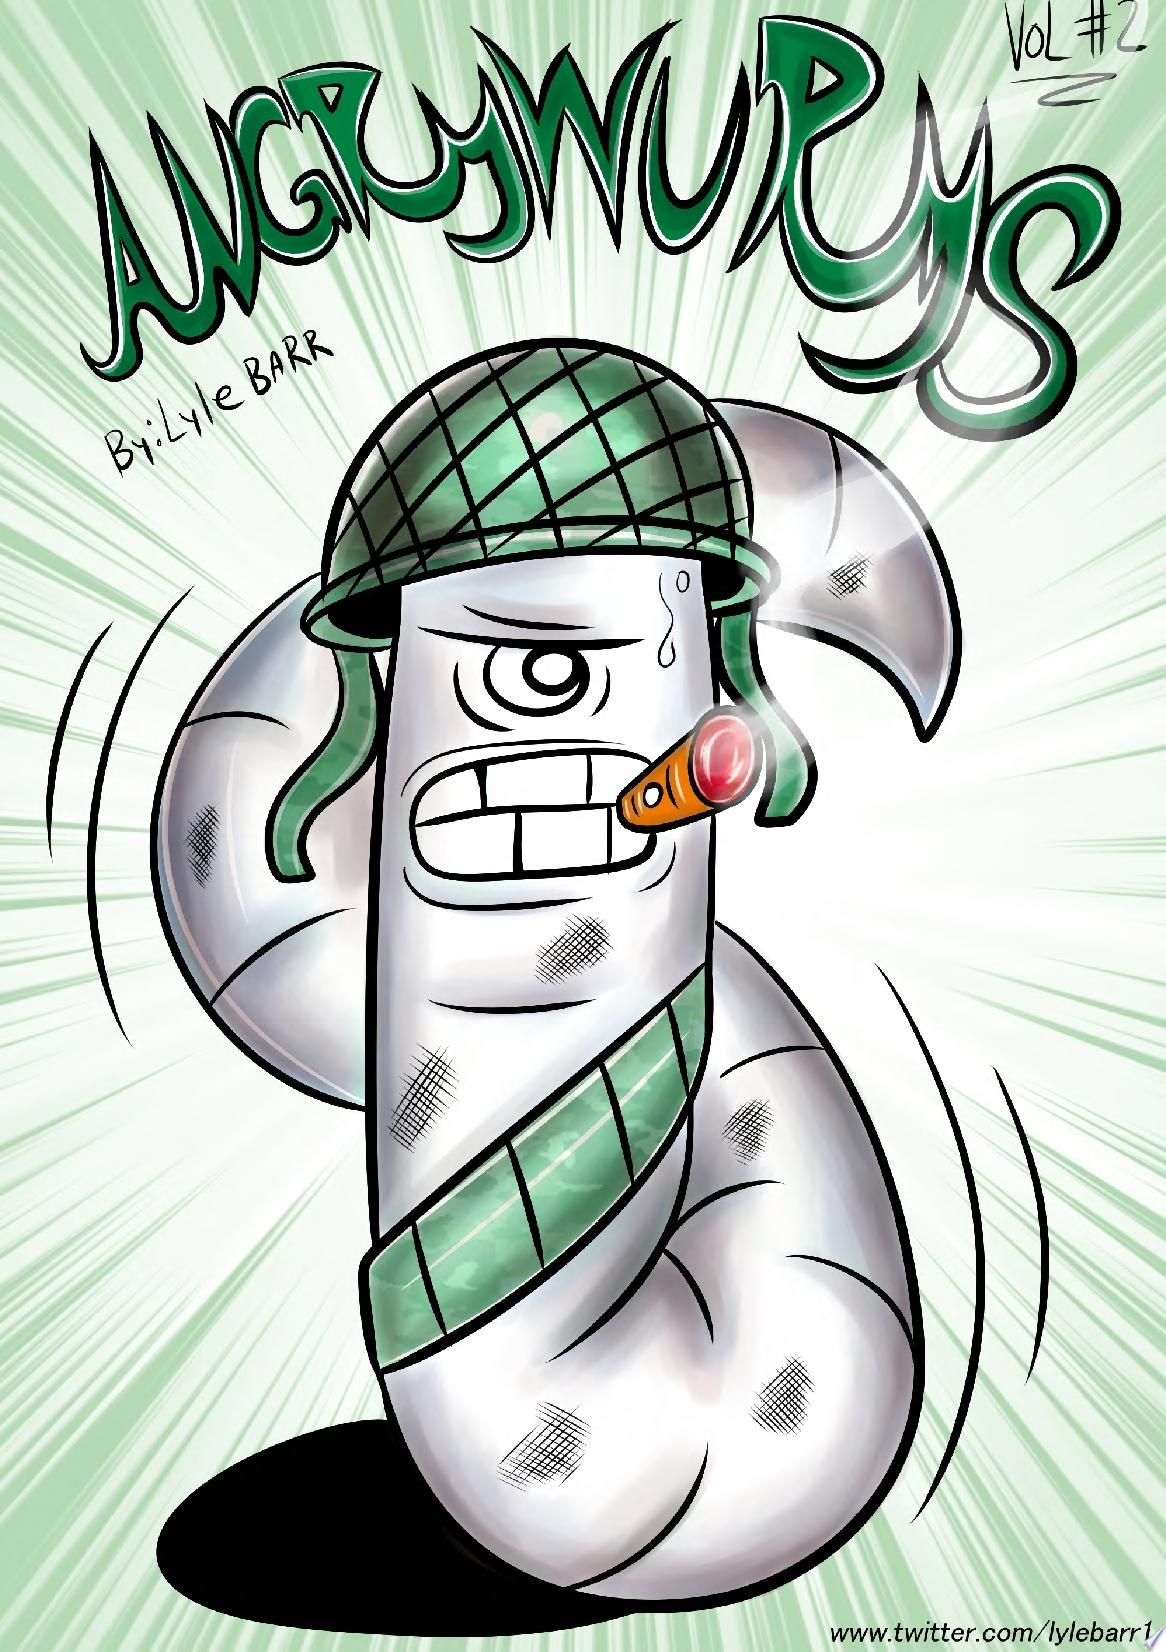 Angrywurms vol  2